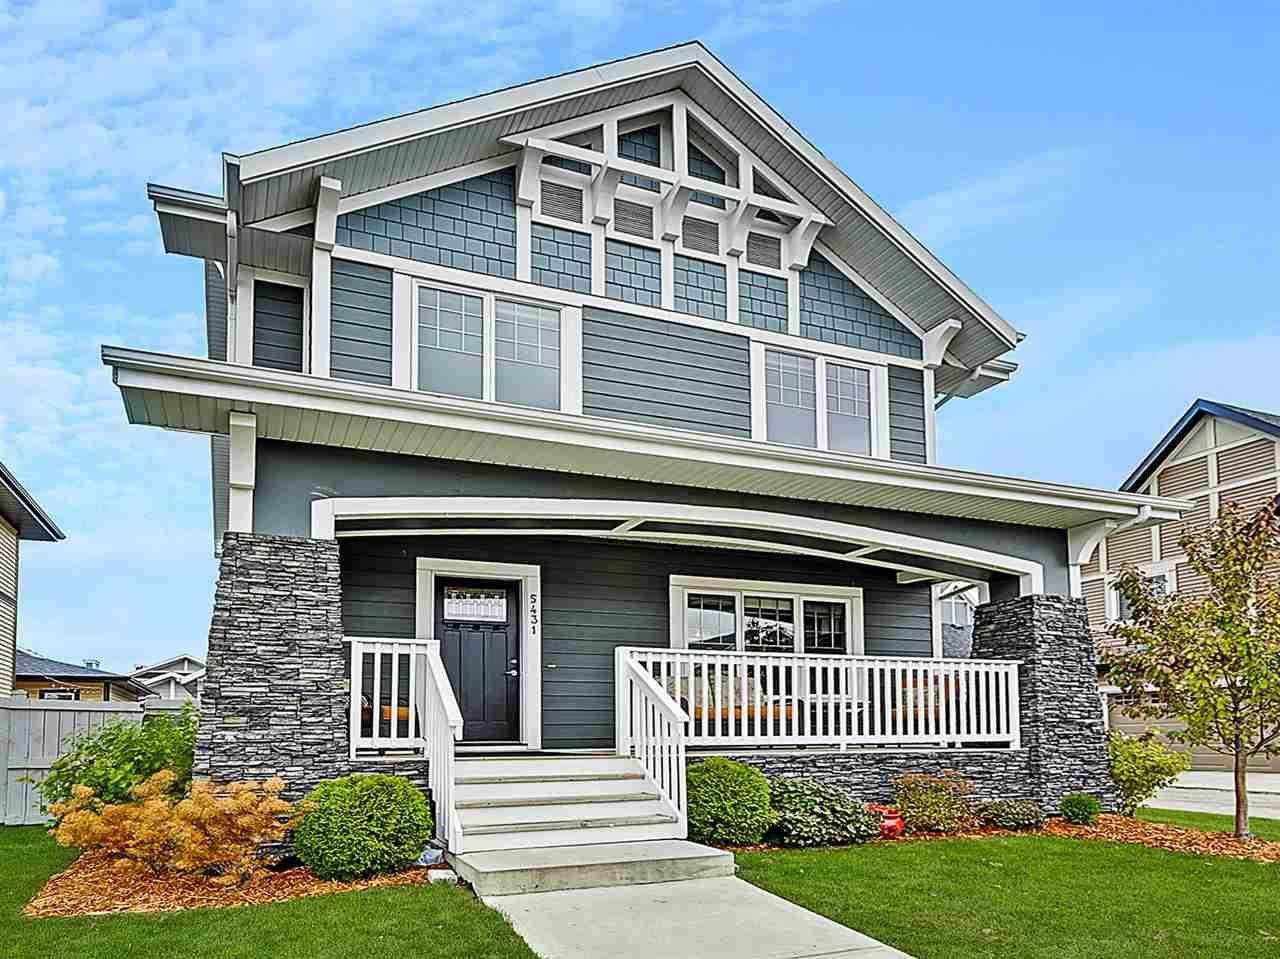 House for sale at 5431 Bonaventure Ave Nw Edmonton Alberta - MLS: E4177221